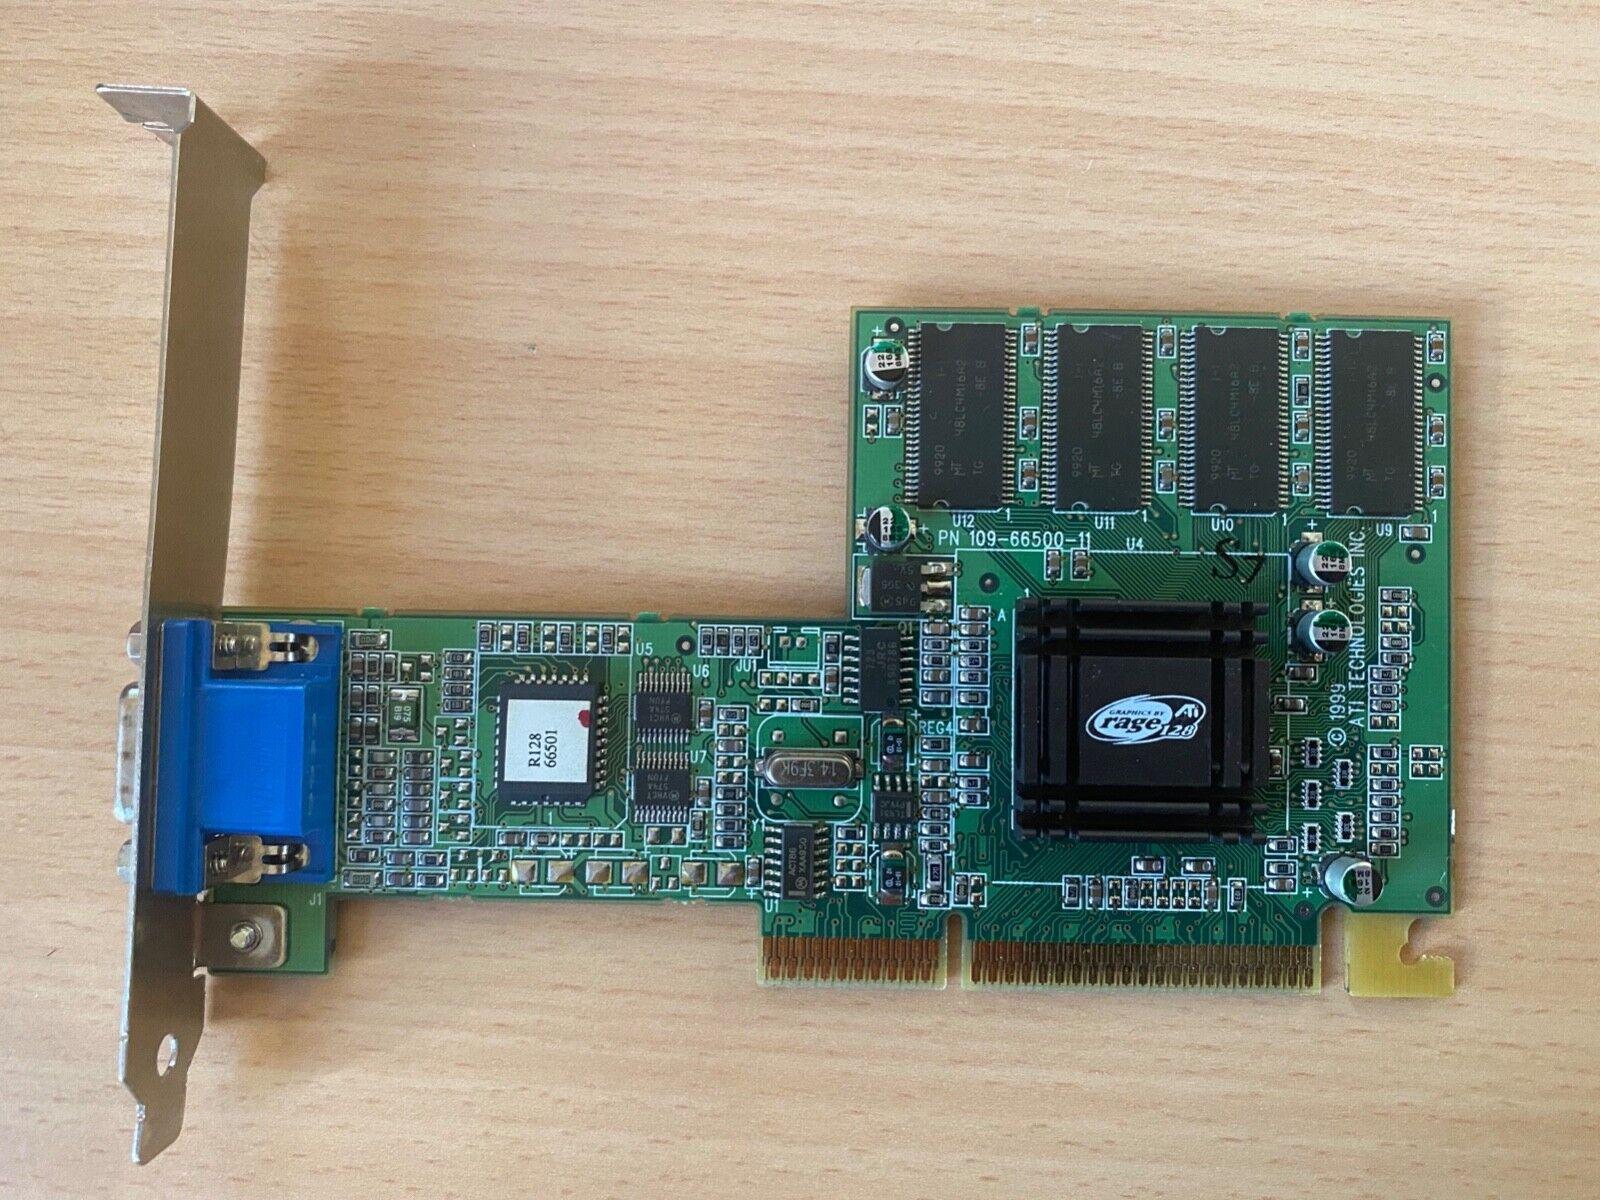 AGP Grafikkarte PN 109-52100-01, ATI Rage 128 VR, 32 MB SDRAM, VGA, gebraucht